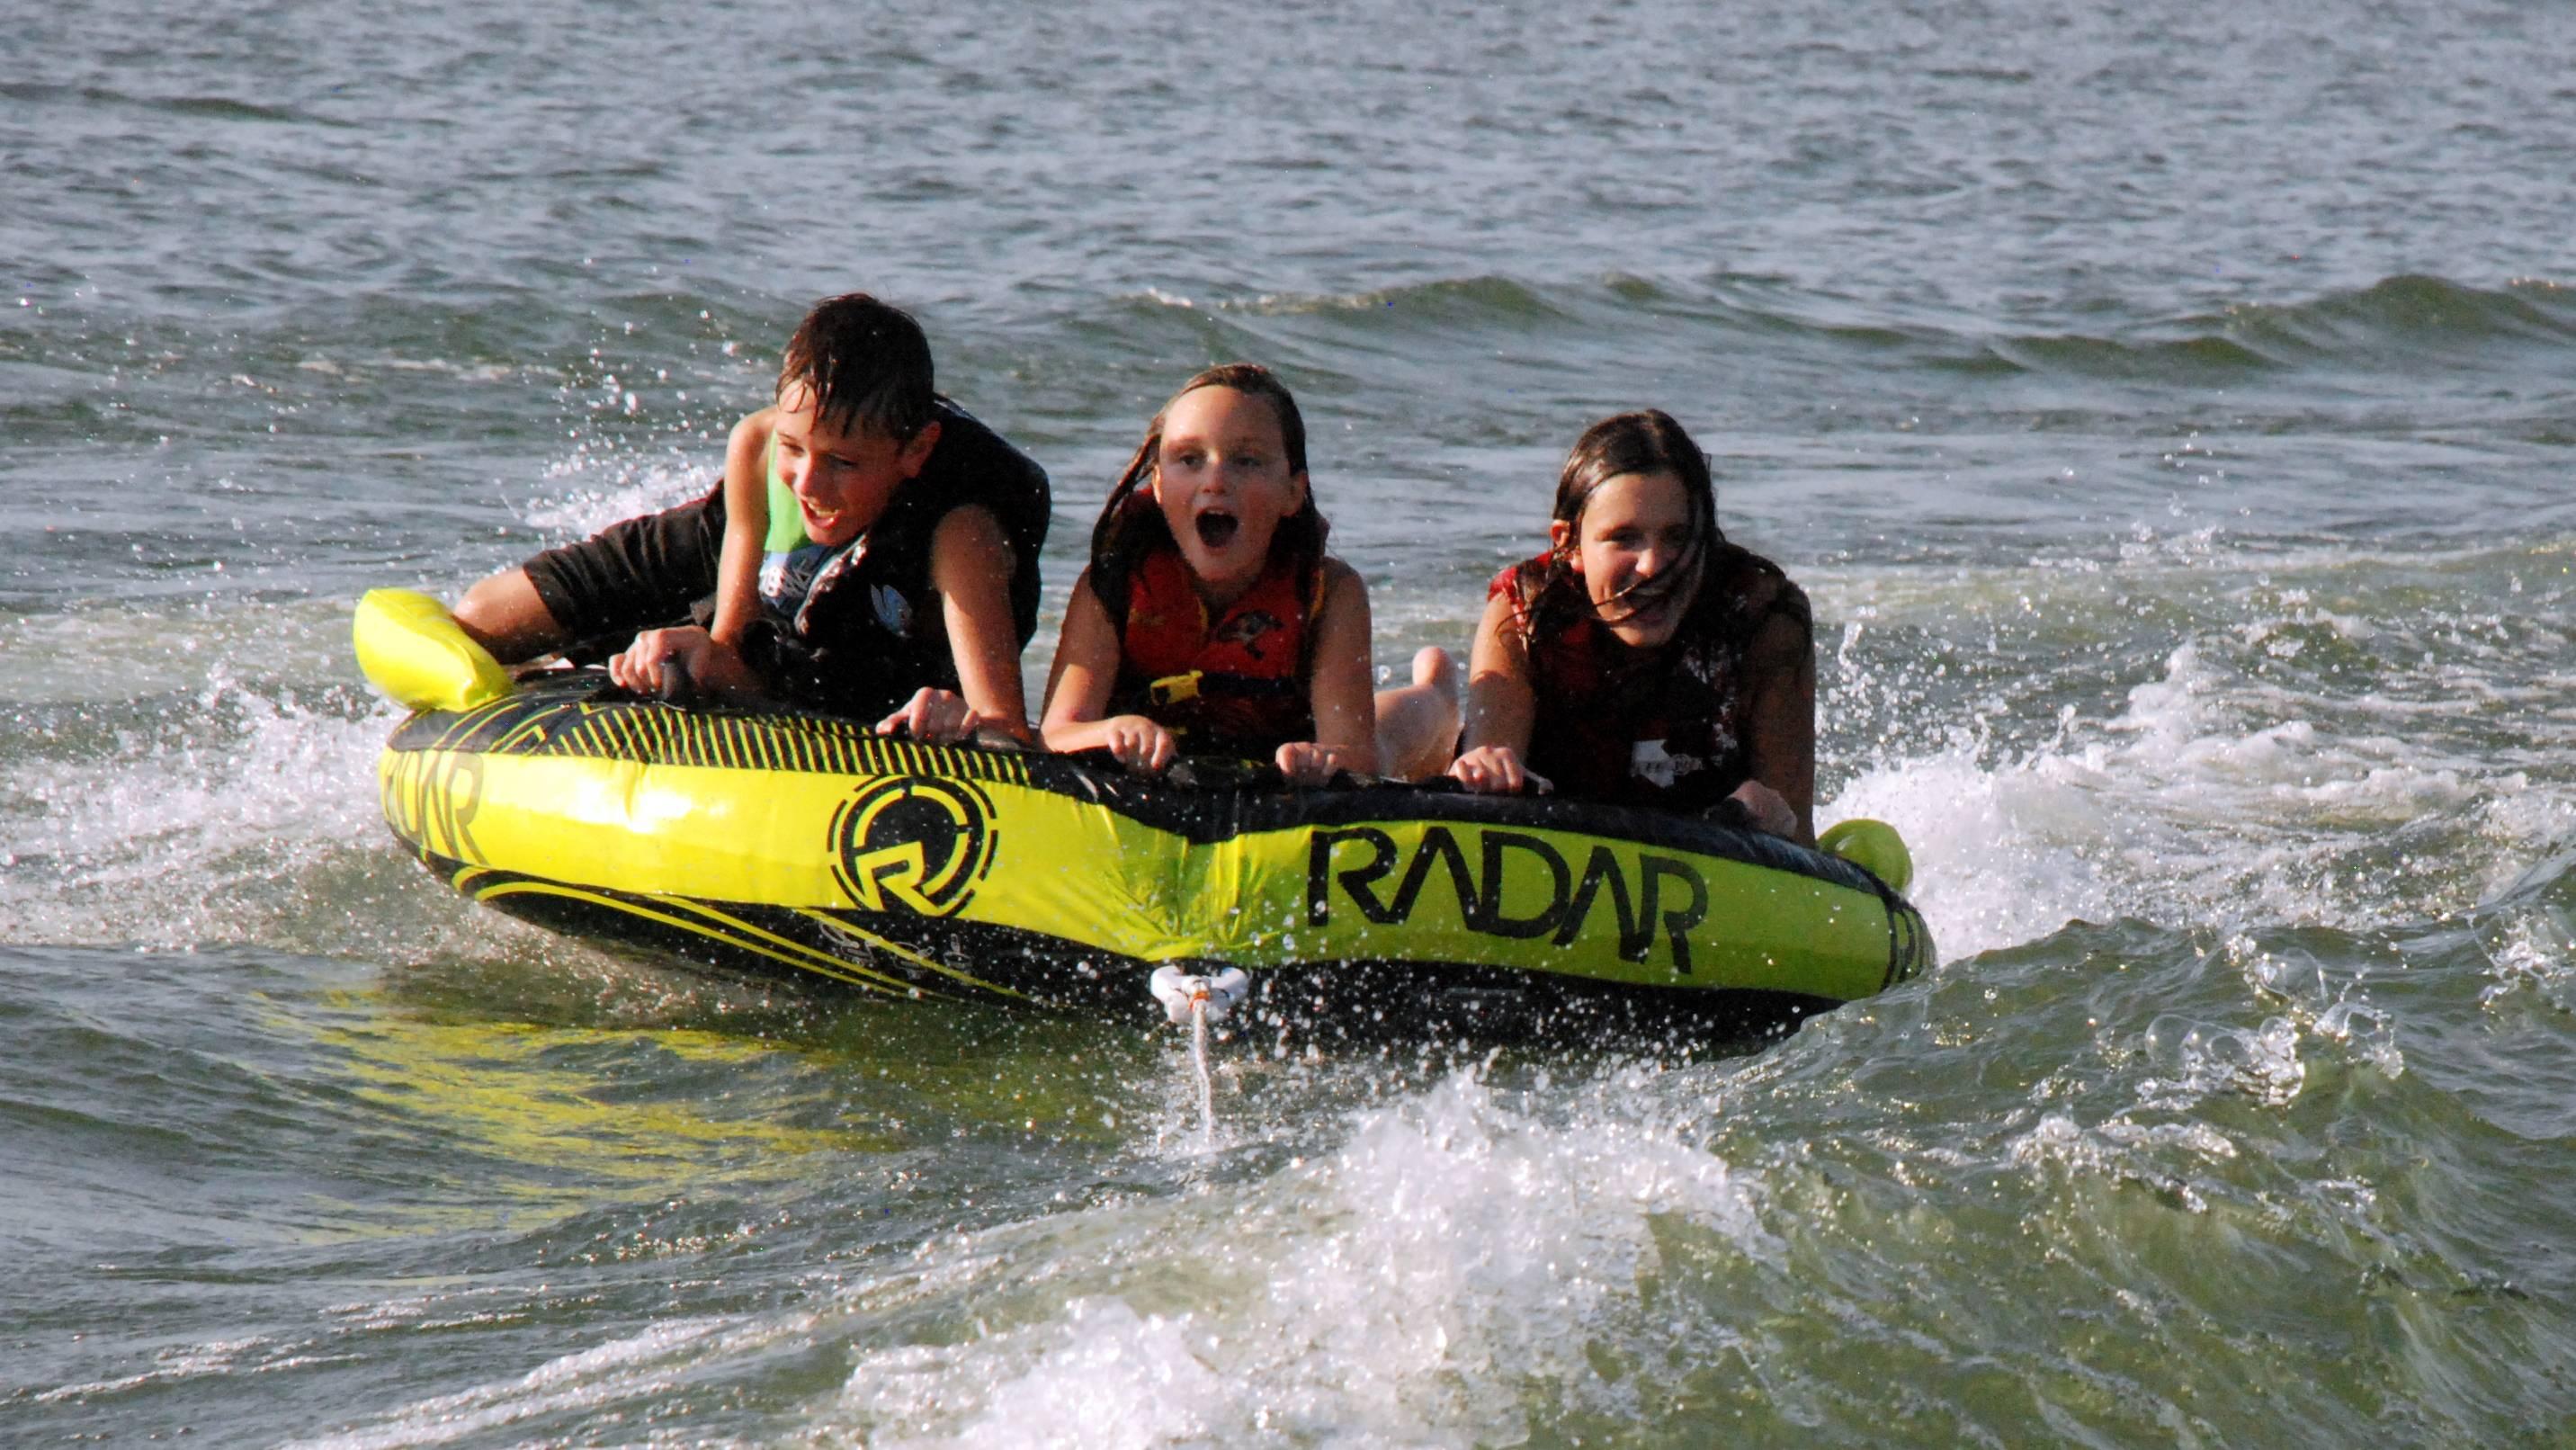 Children tubing